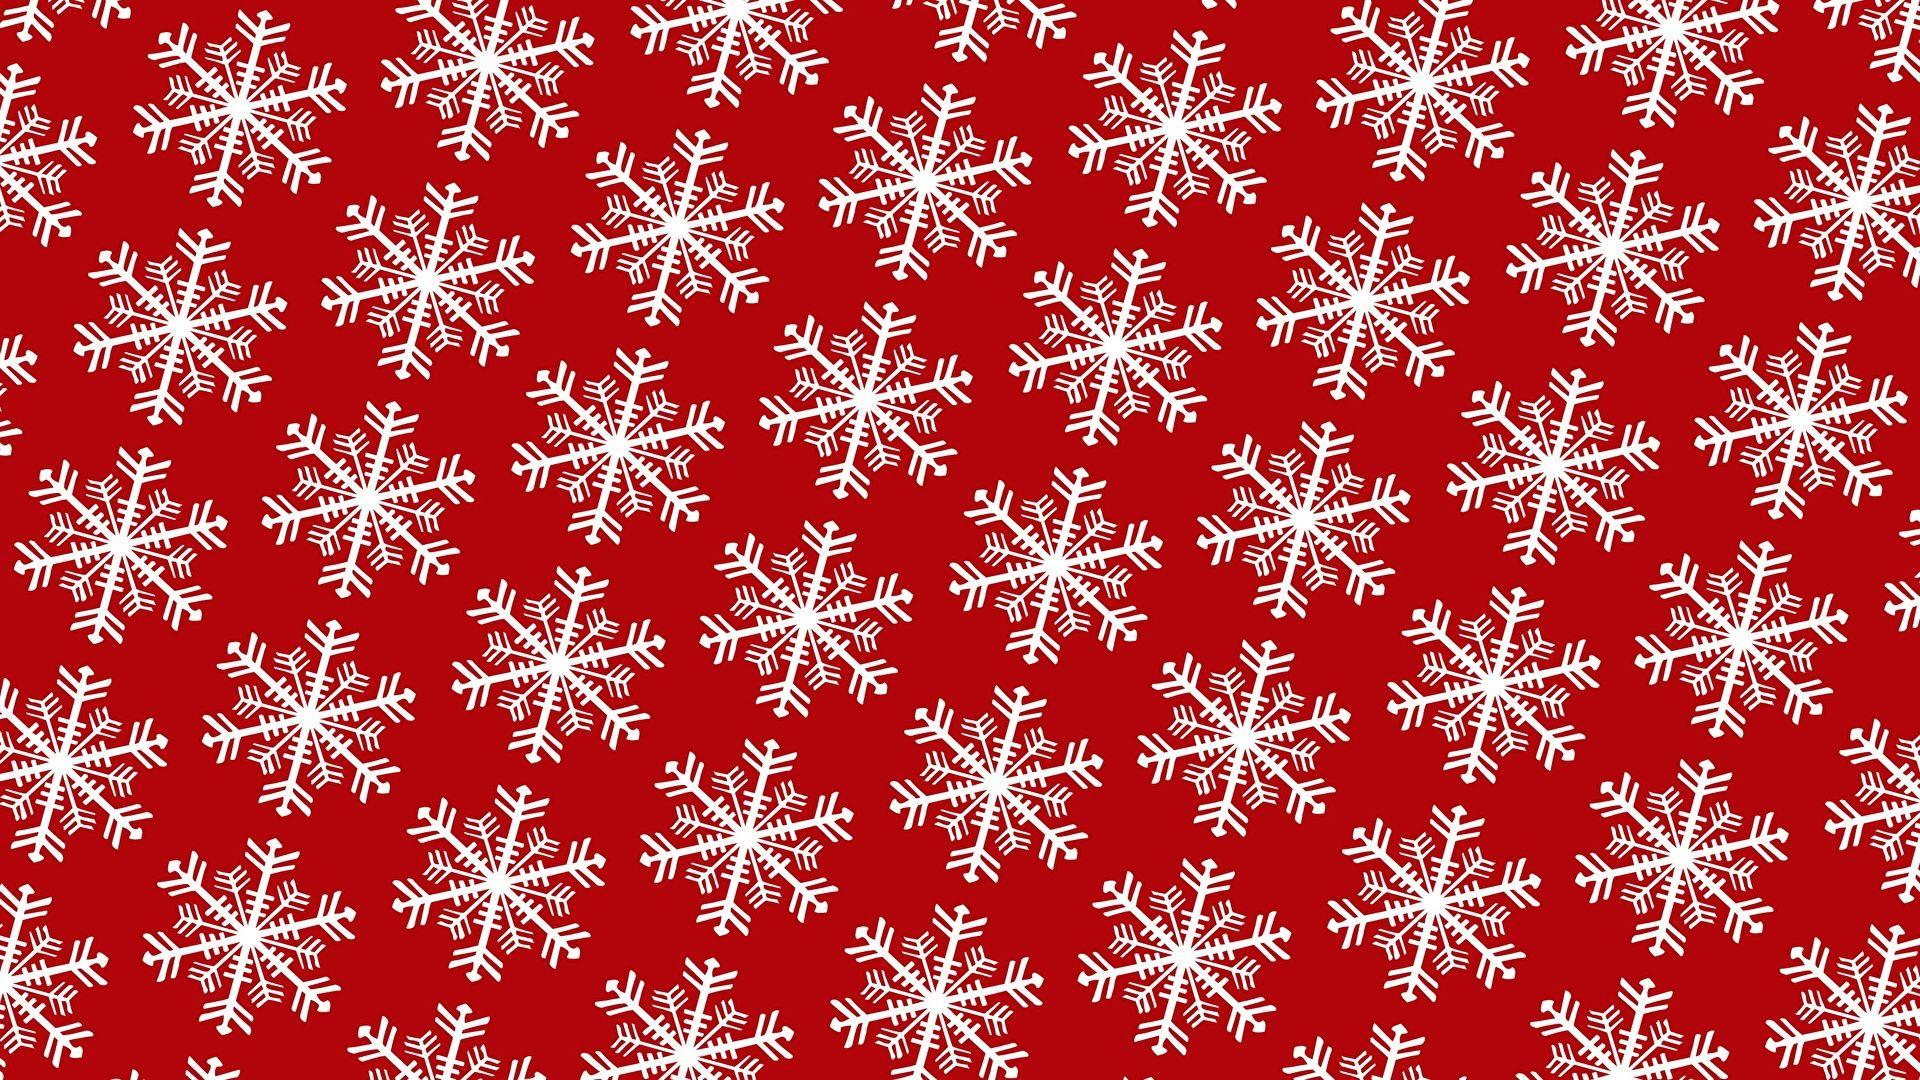 Christmas Scrapbooking good wallpaper hd